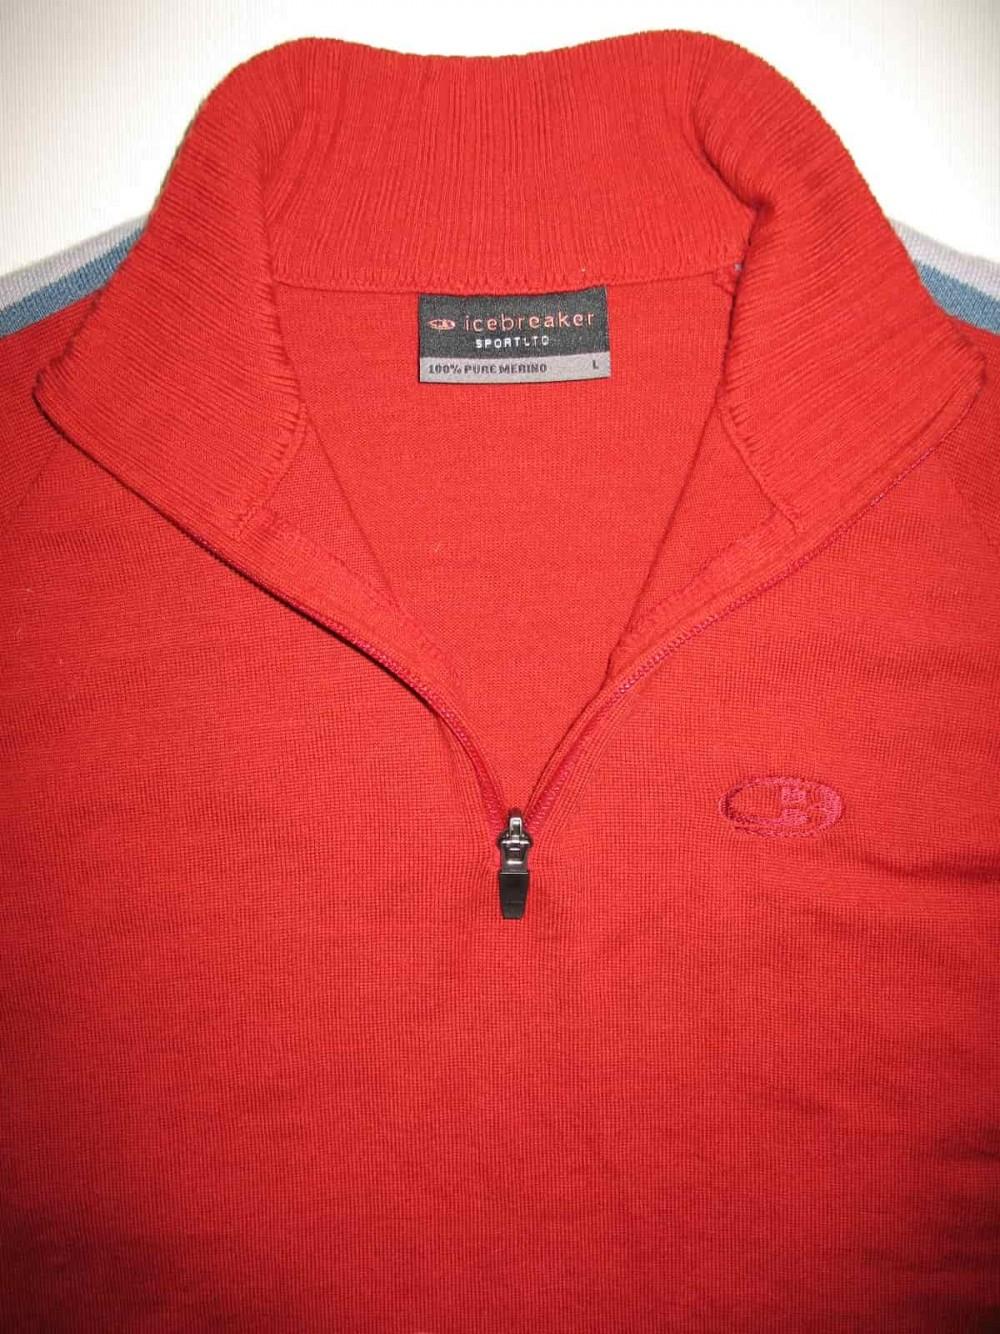 Кофта ICEBREAKER sport LTD jersey (размер L) - 3